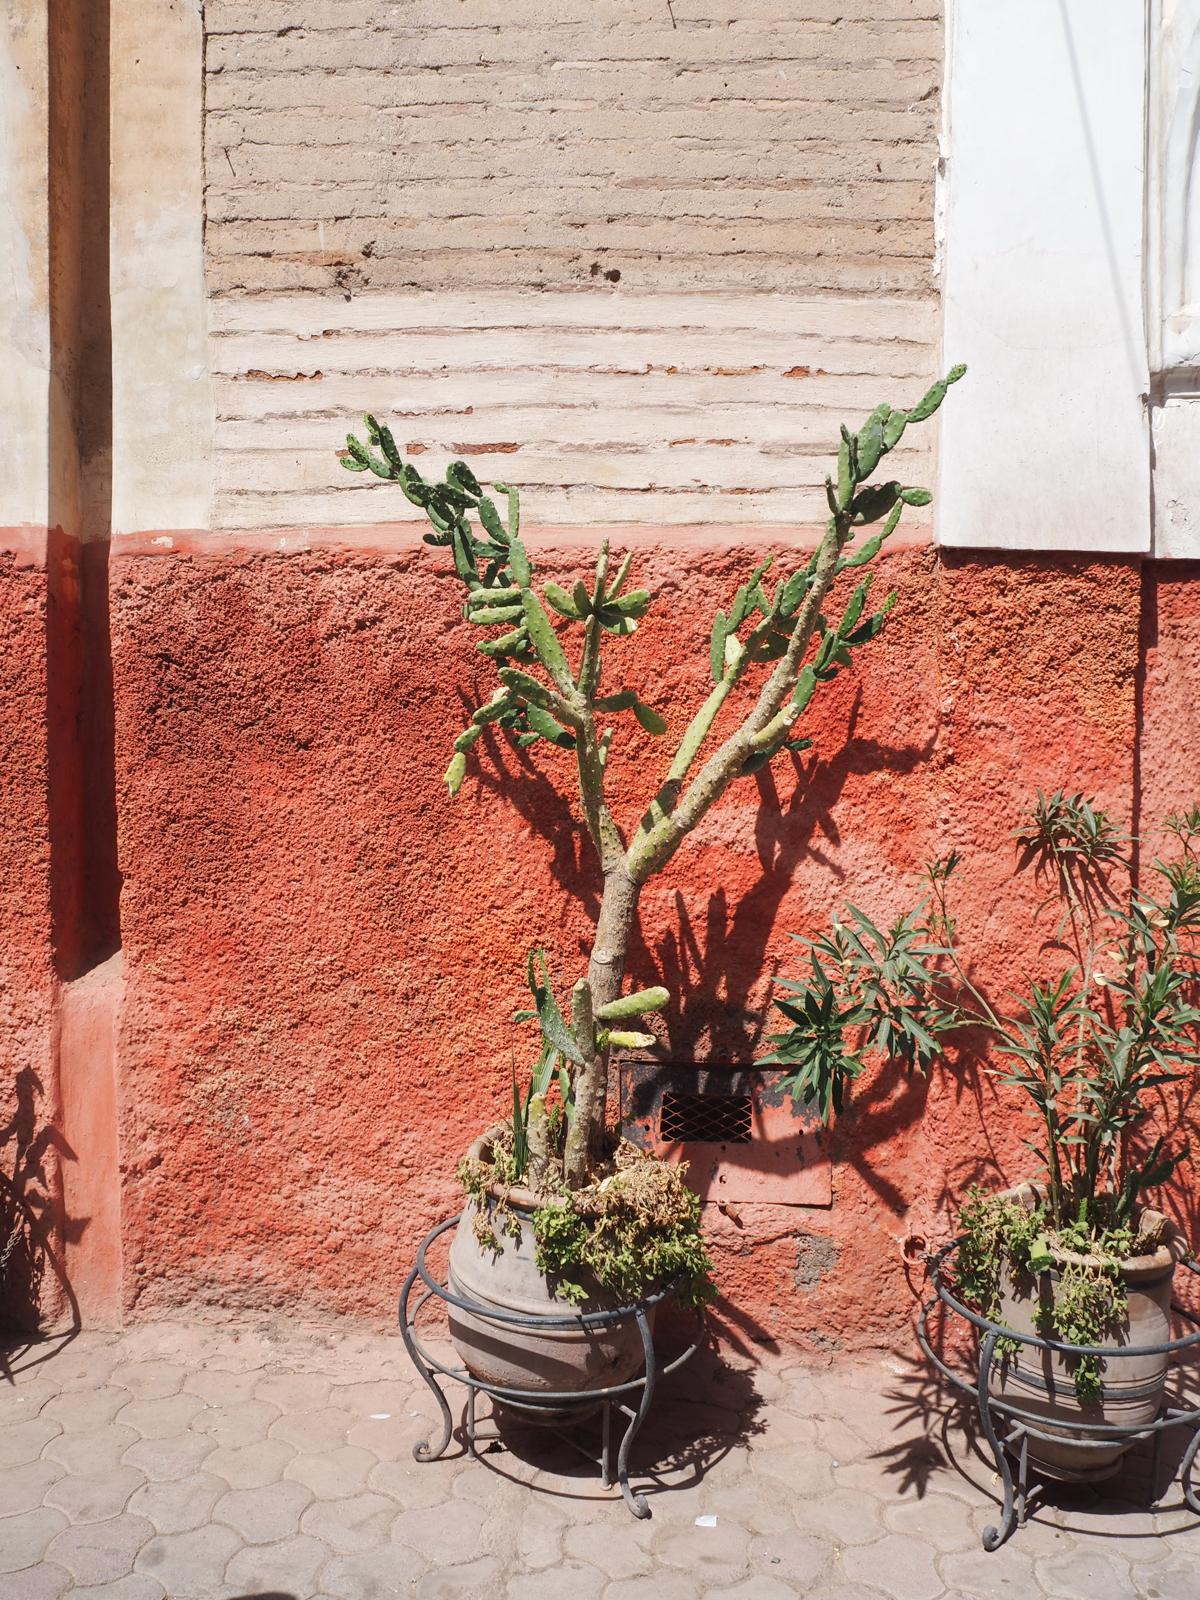 bare-minds-elina-neumann-marrakesch-marokko-5